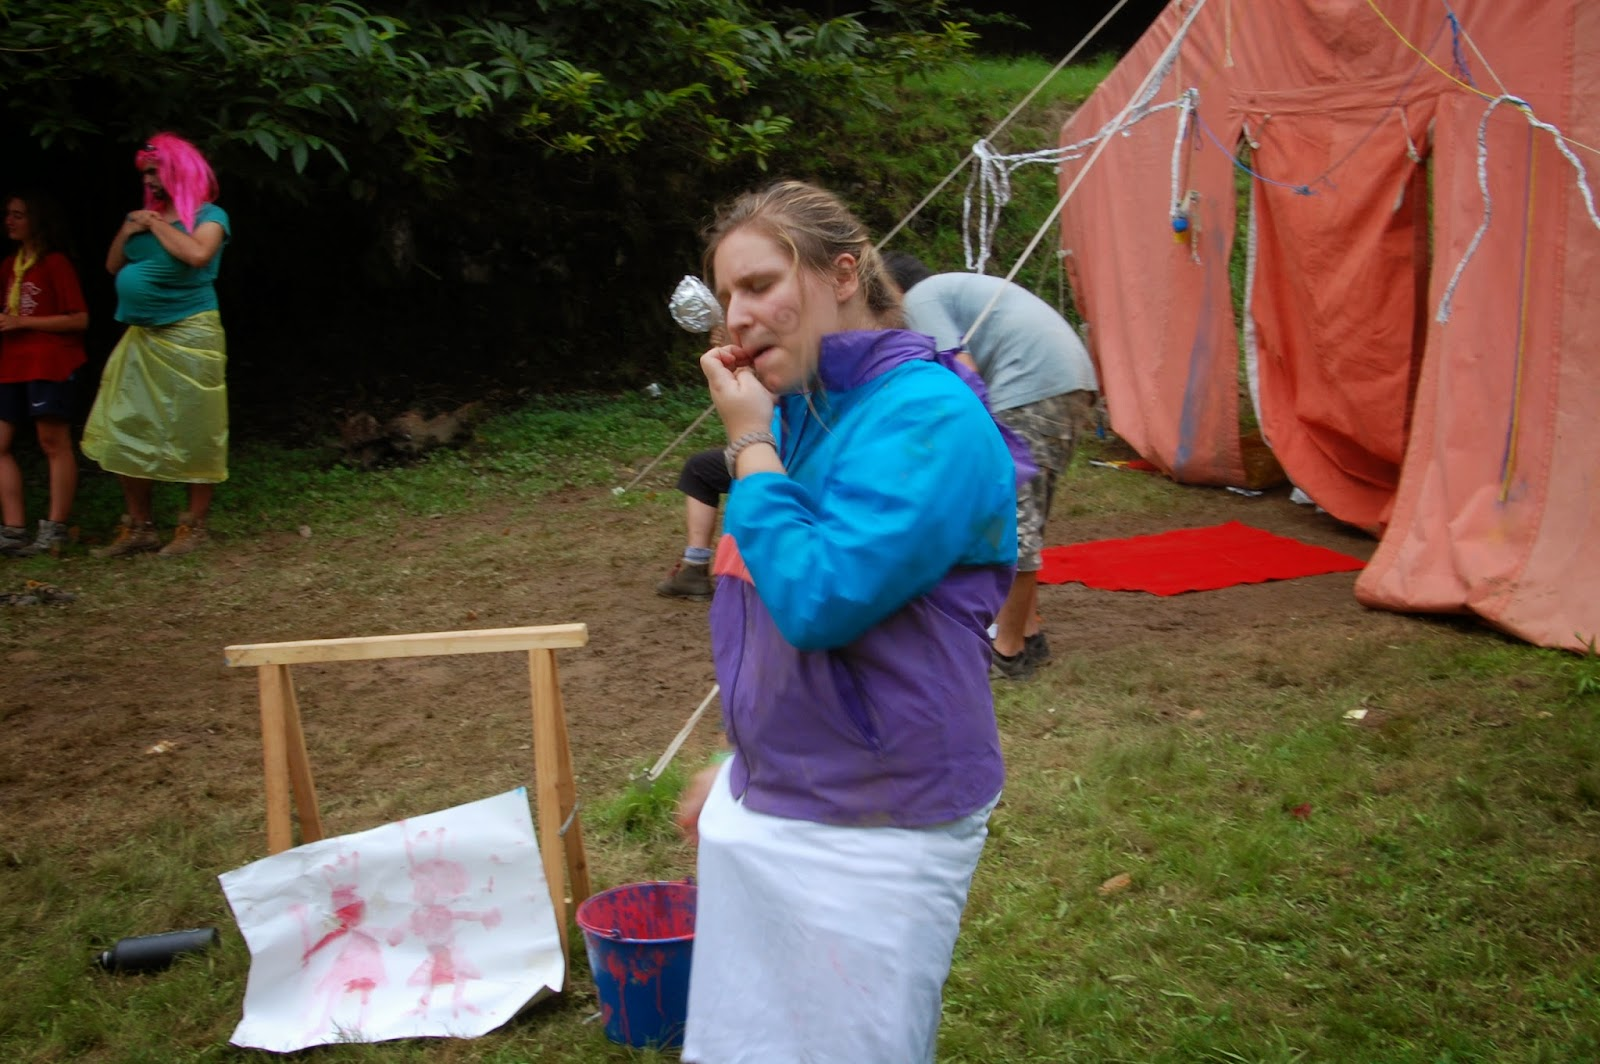 Campaments Estiu RolandKing 2011 - DSC_0279.JPG